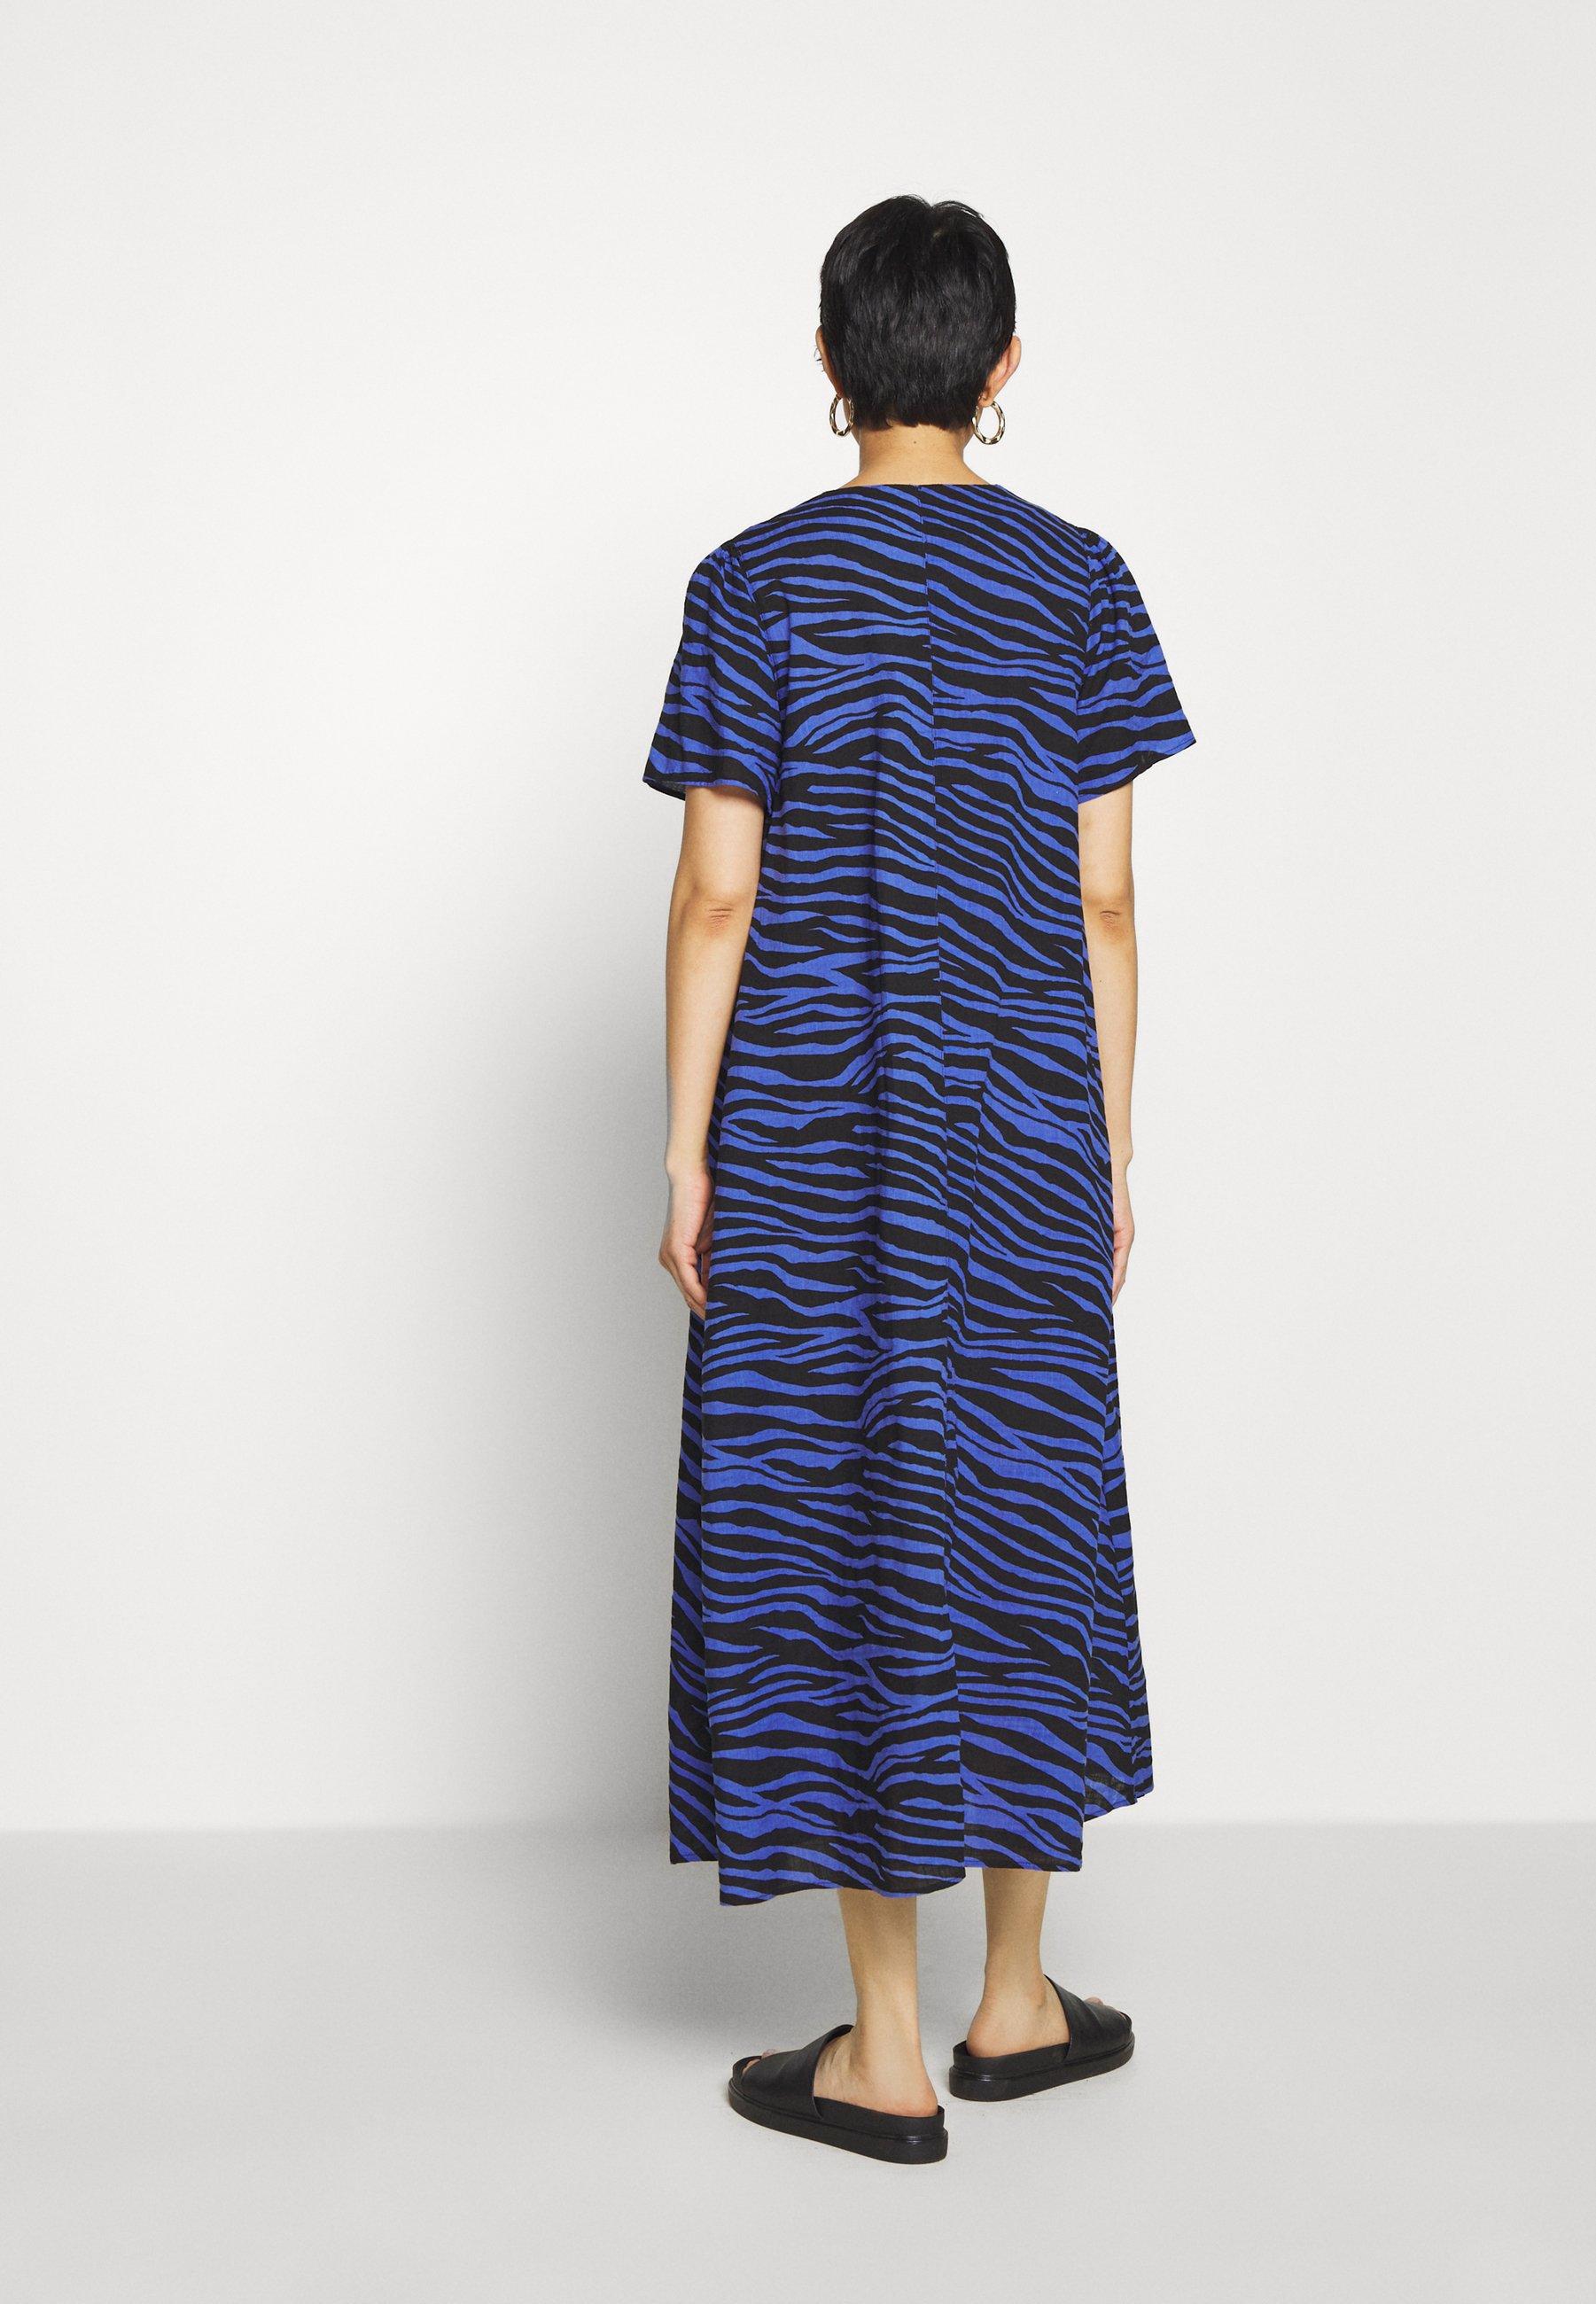 Najtańsze Duża obniżka Résumé UMANI - Sukienka letnia - crown blue   Odzież damska 2020 jP4o6